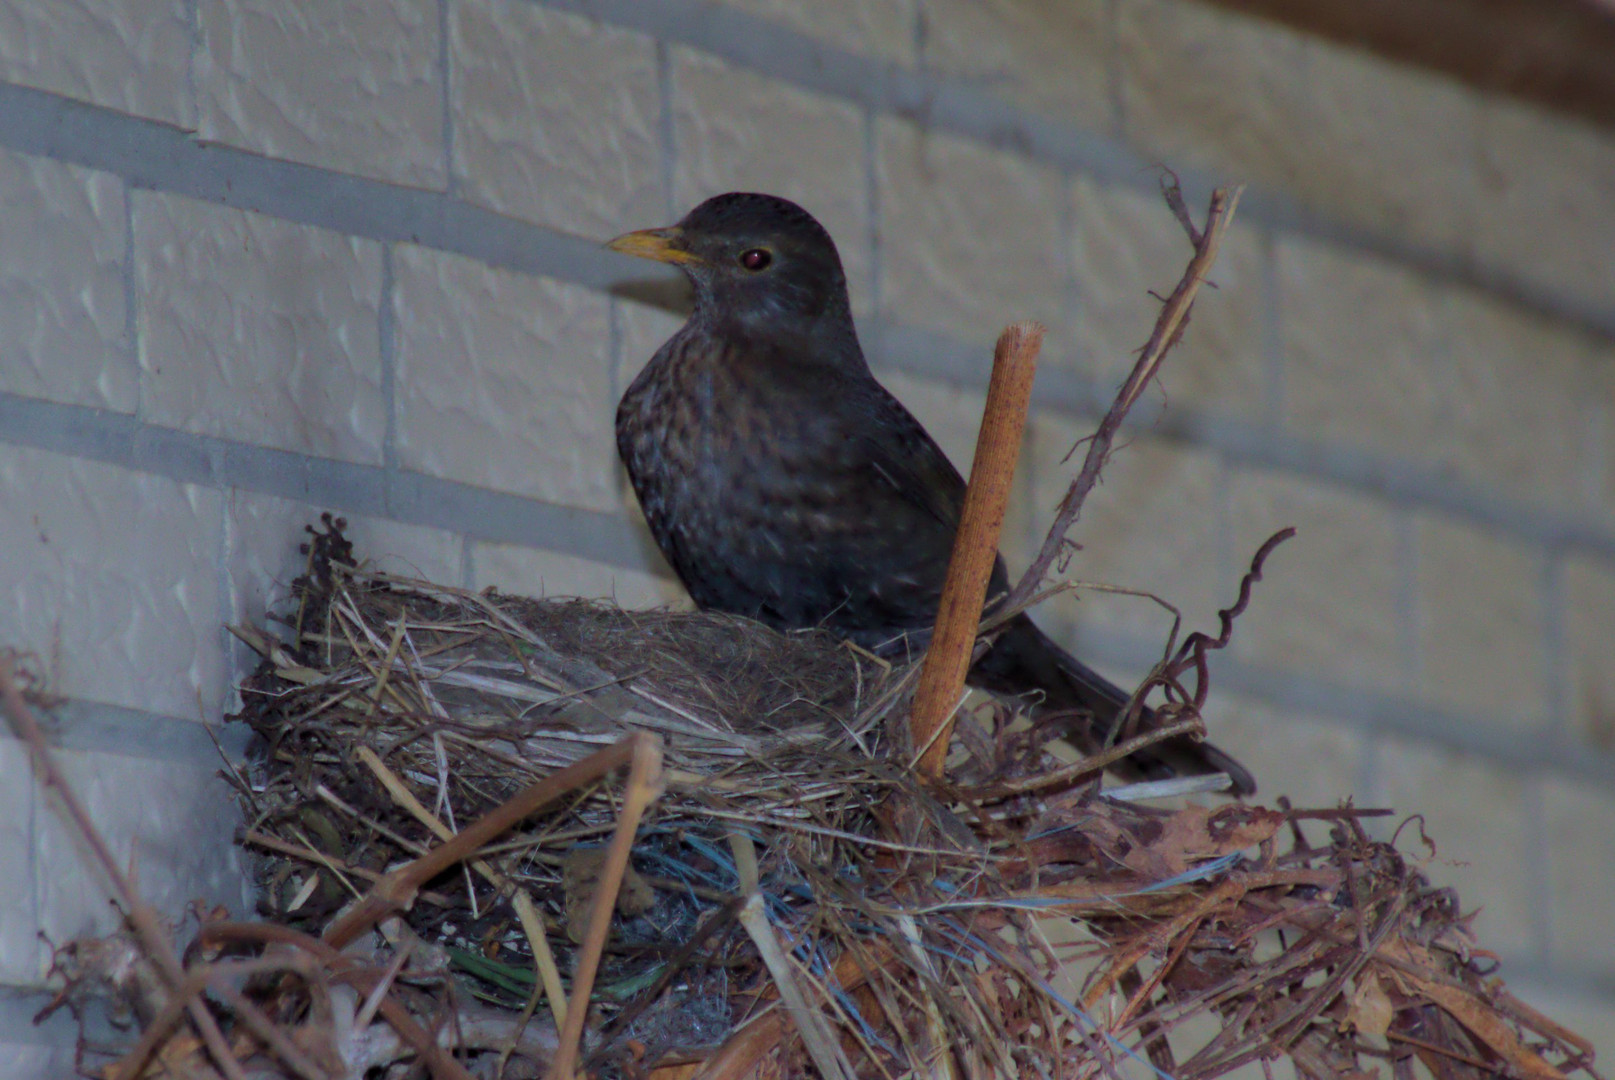 Amsel nest